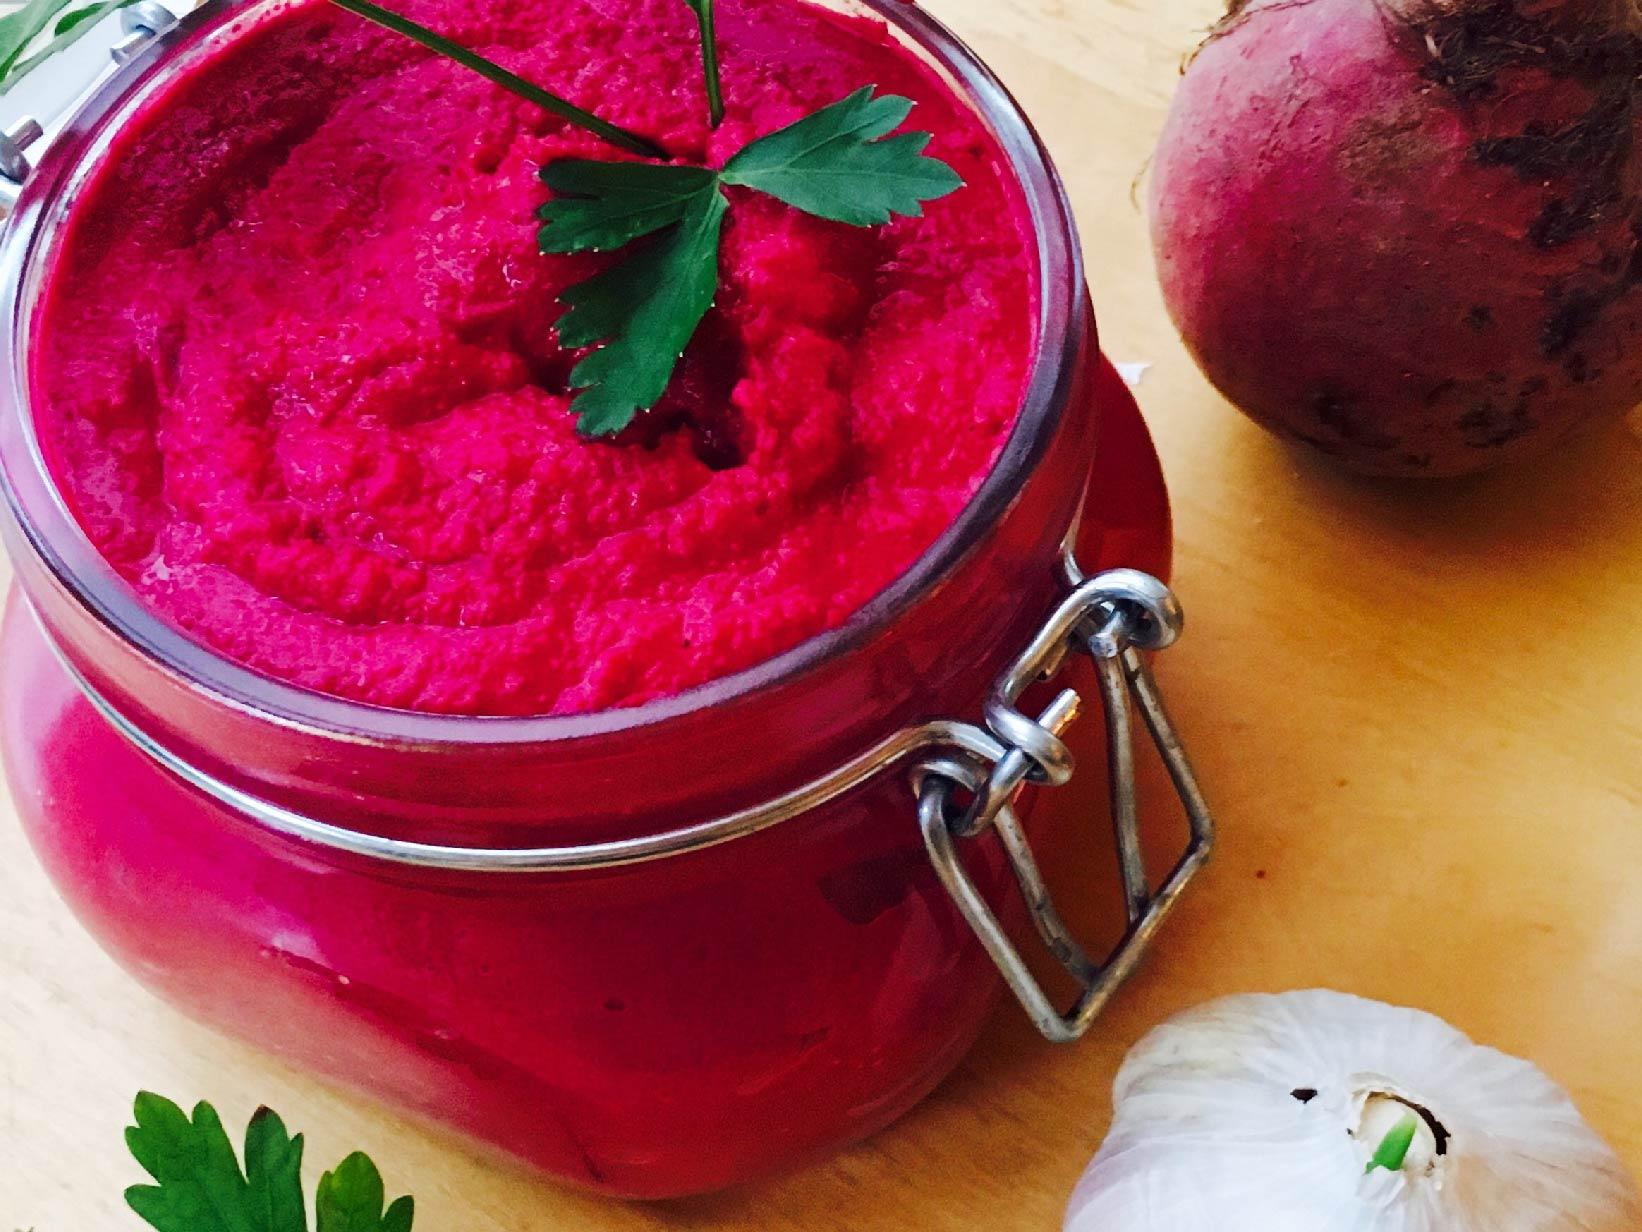 Roasted Beet Hummus_Nourished Body and Mind_ Joanne Schneider